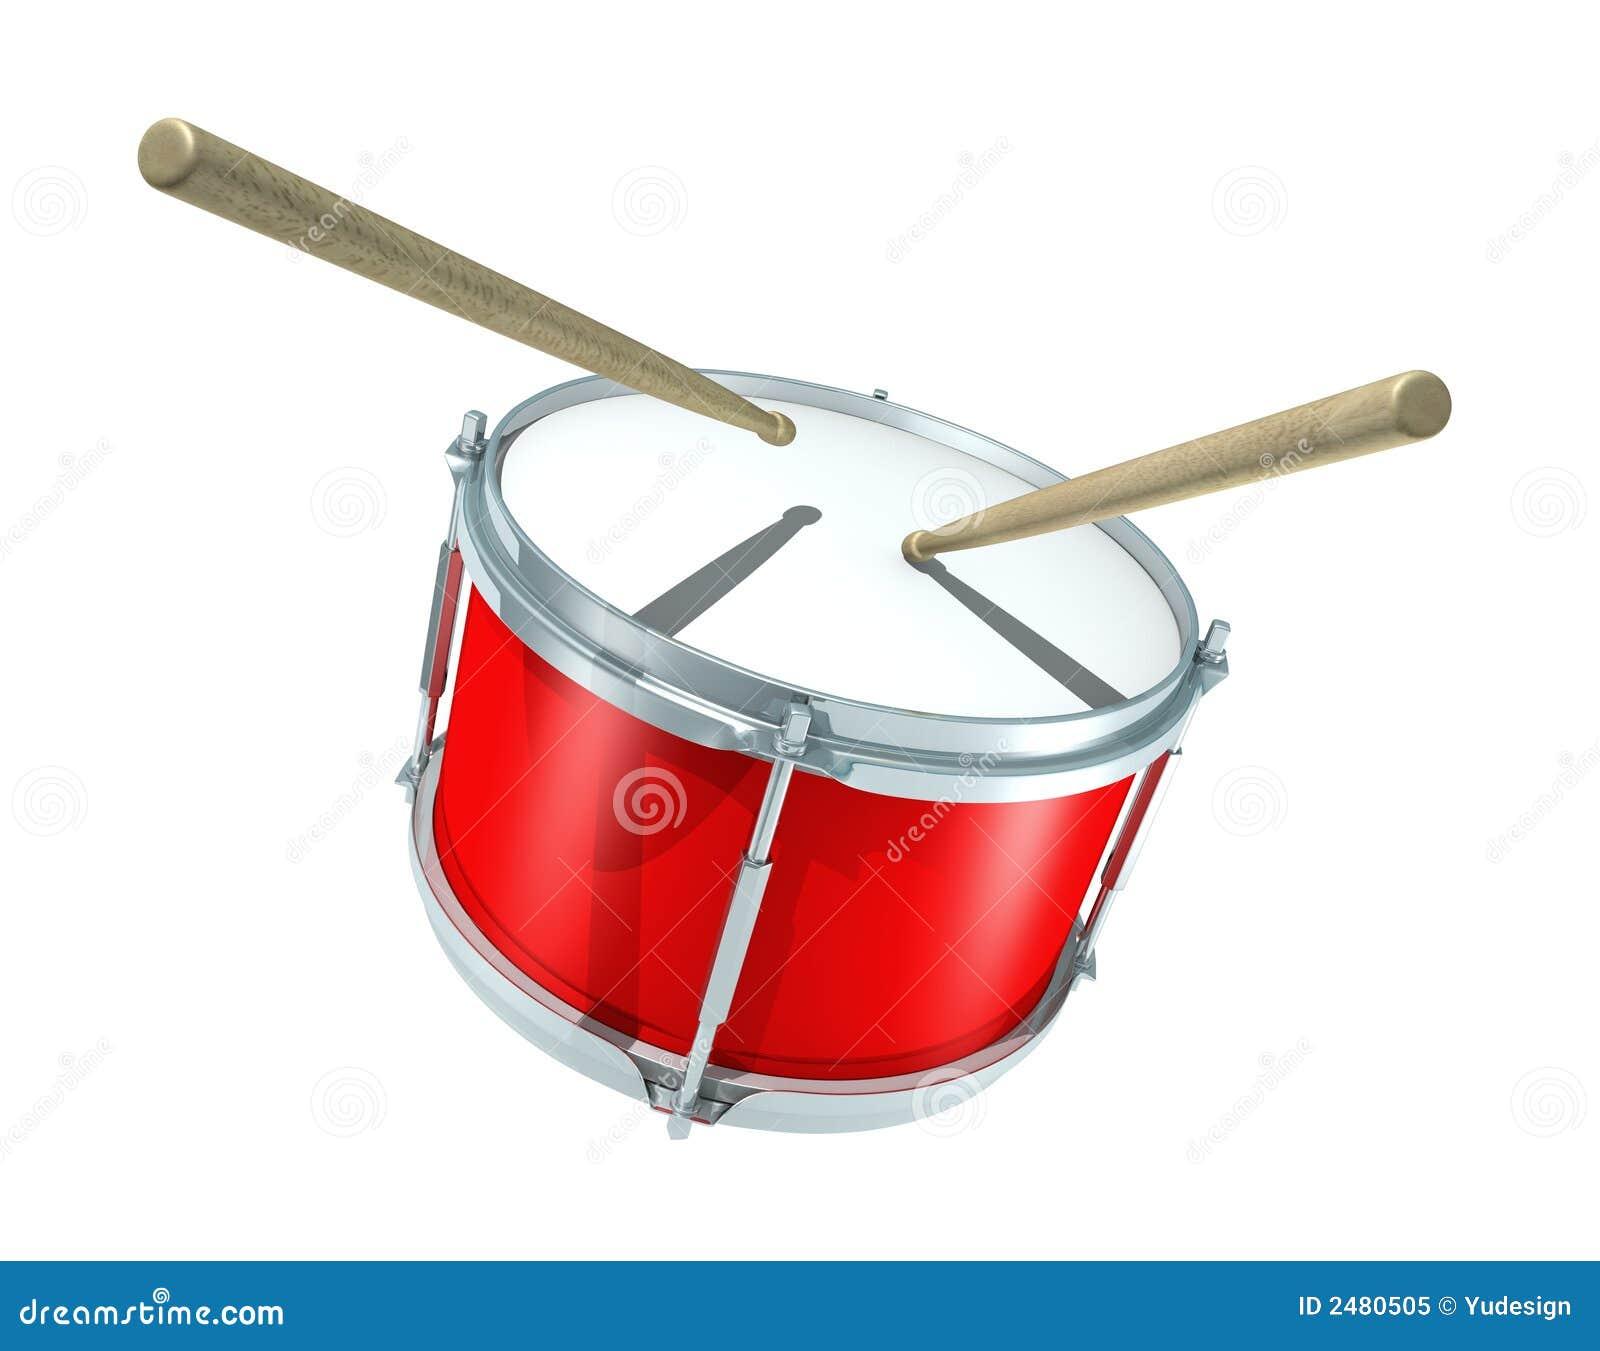 3D rendered illustration of snare drum with drum sticks.